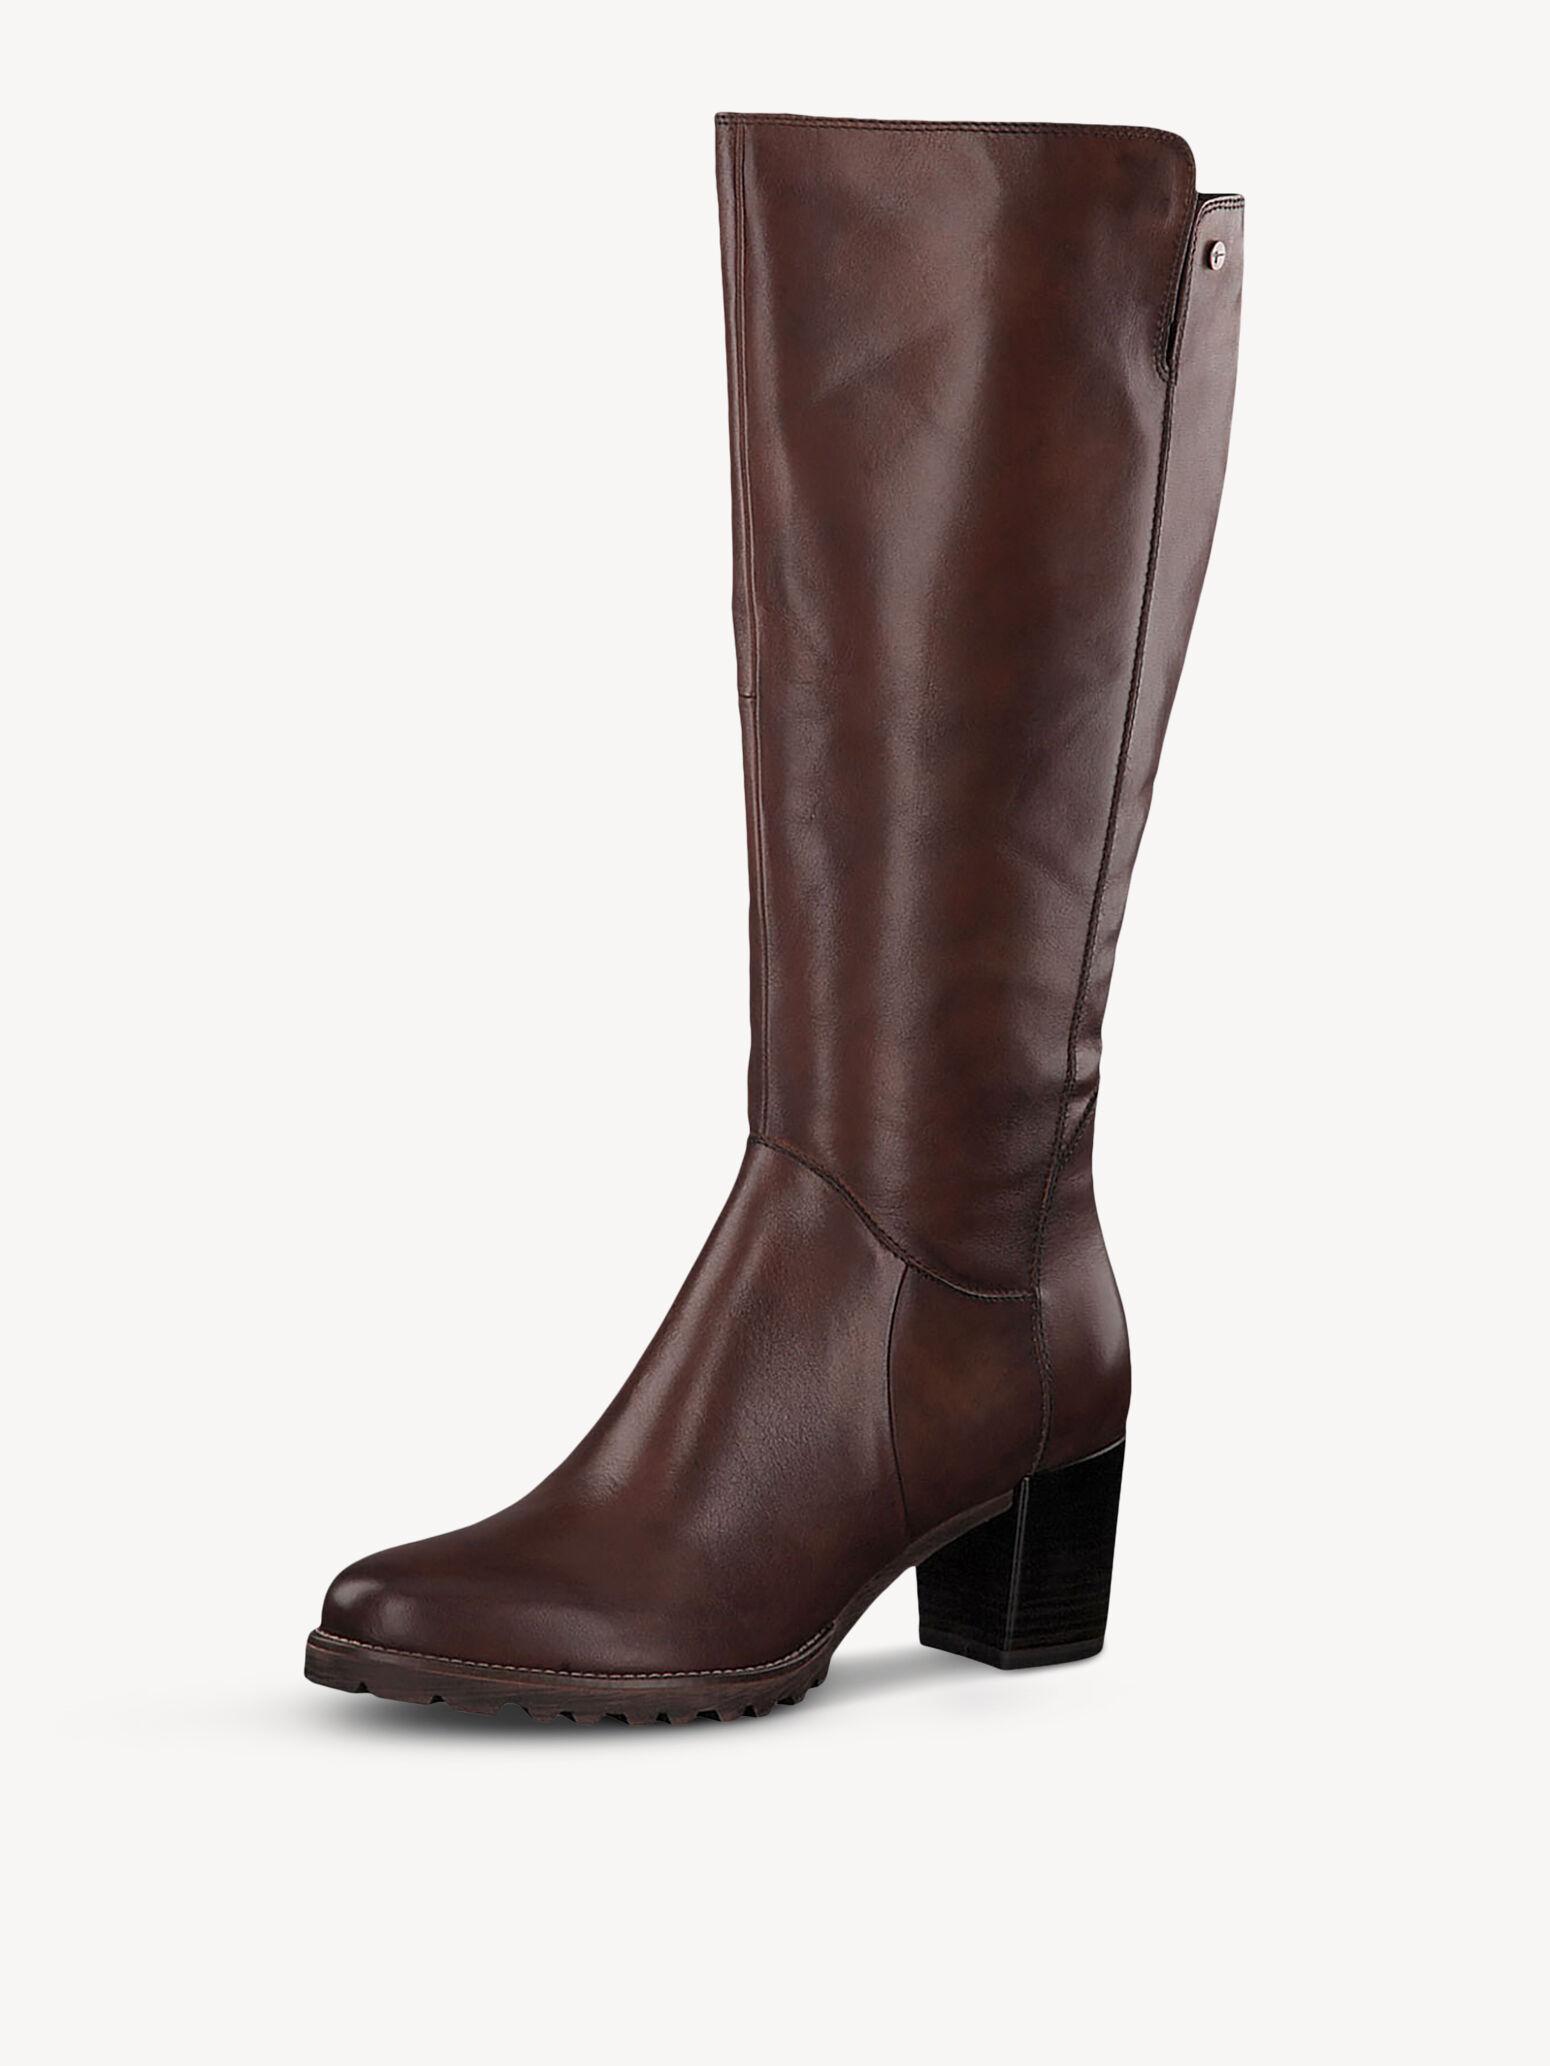 Tamaris 25533 Women's Riding Style Boots